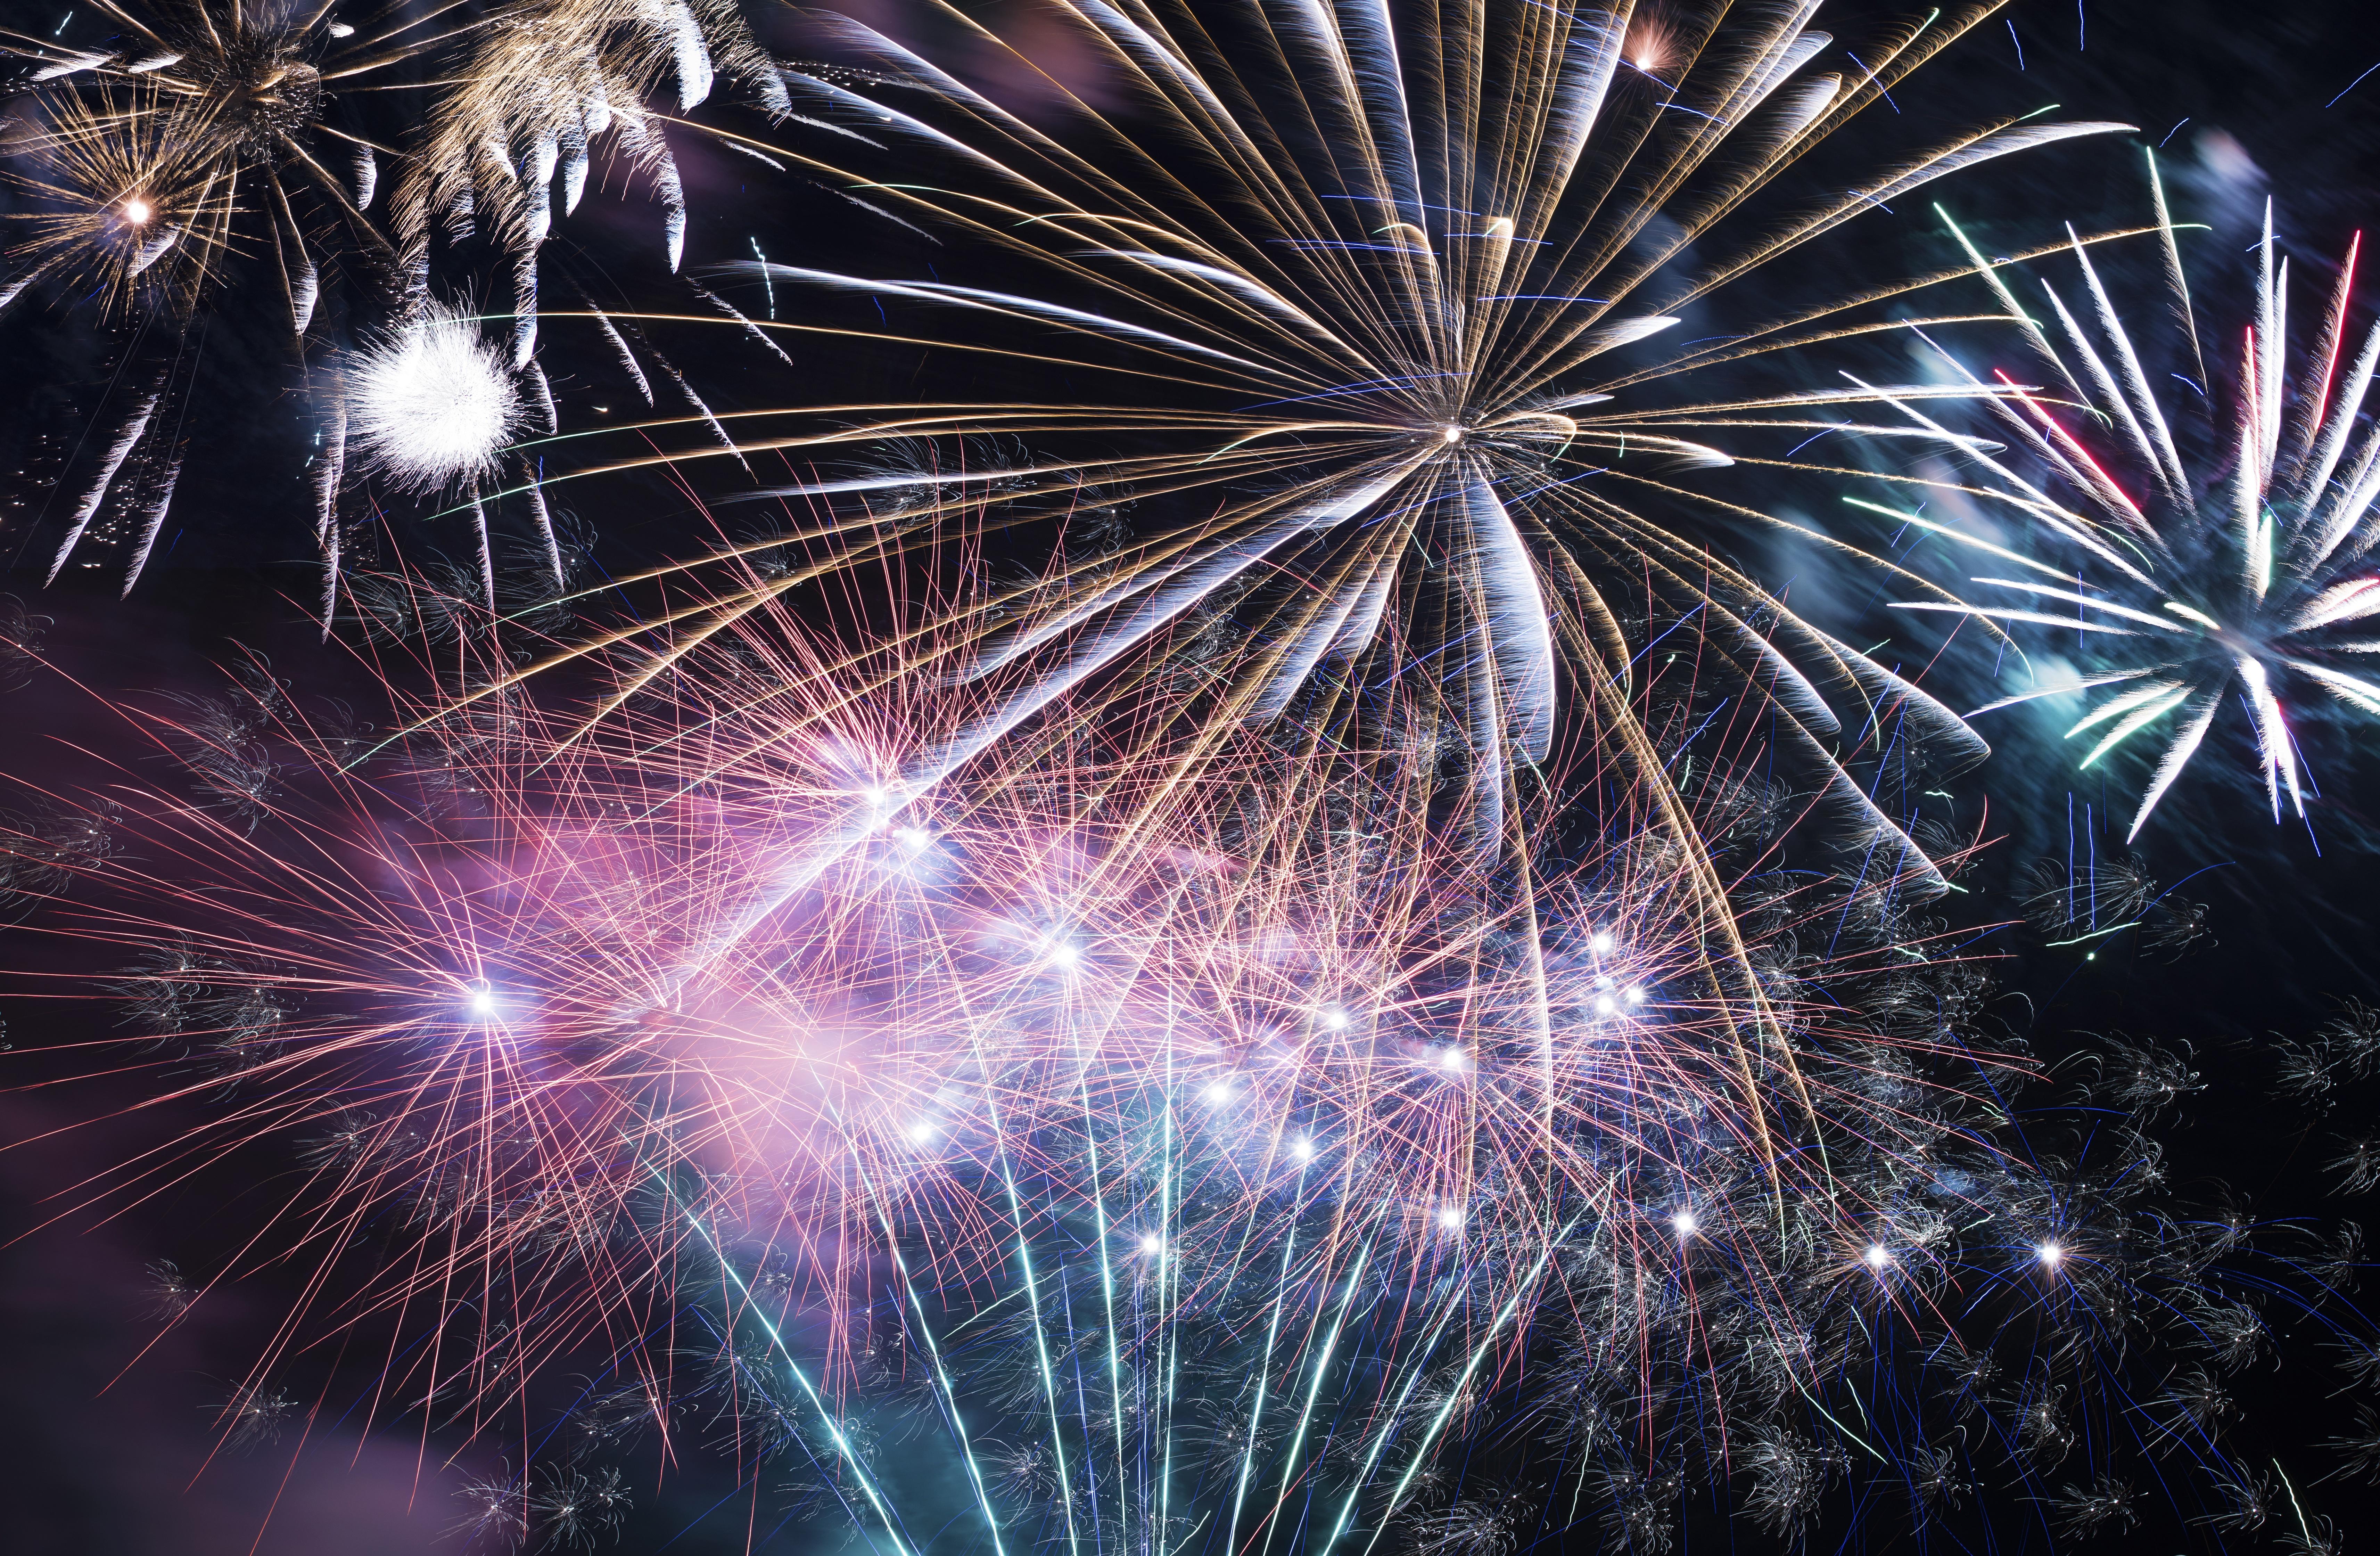 Fireworks Celebration. Colorful Fireworks on Black Sky.